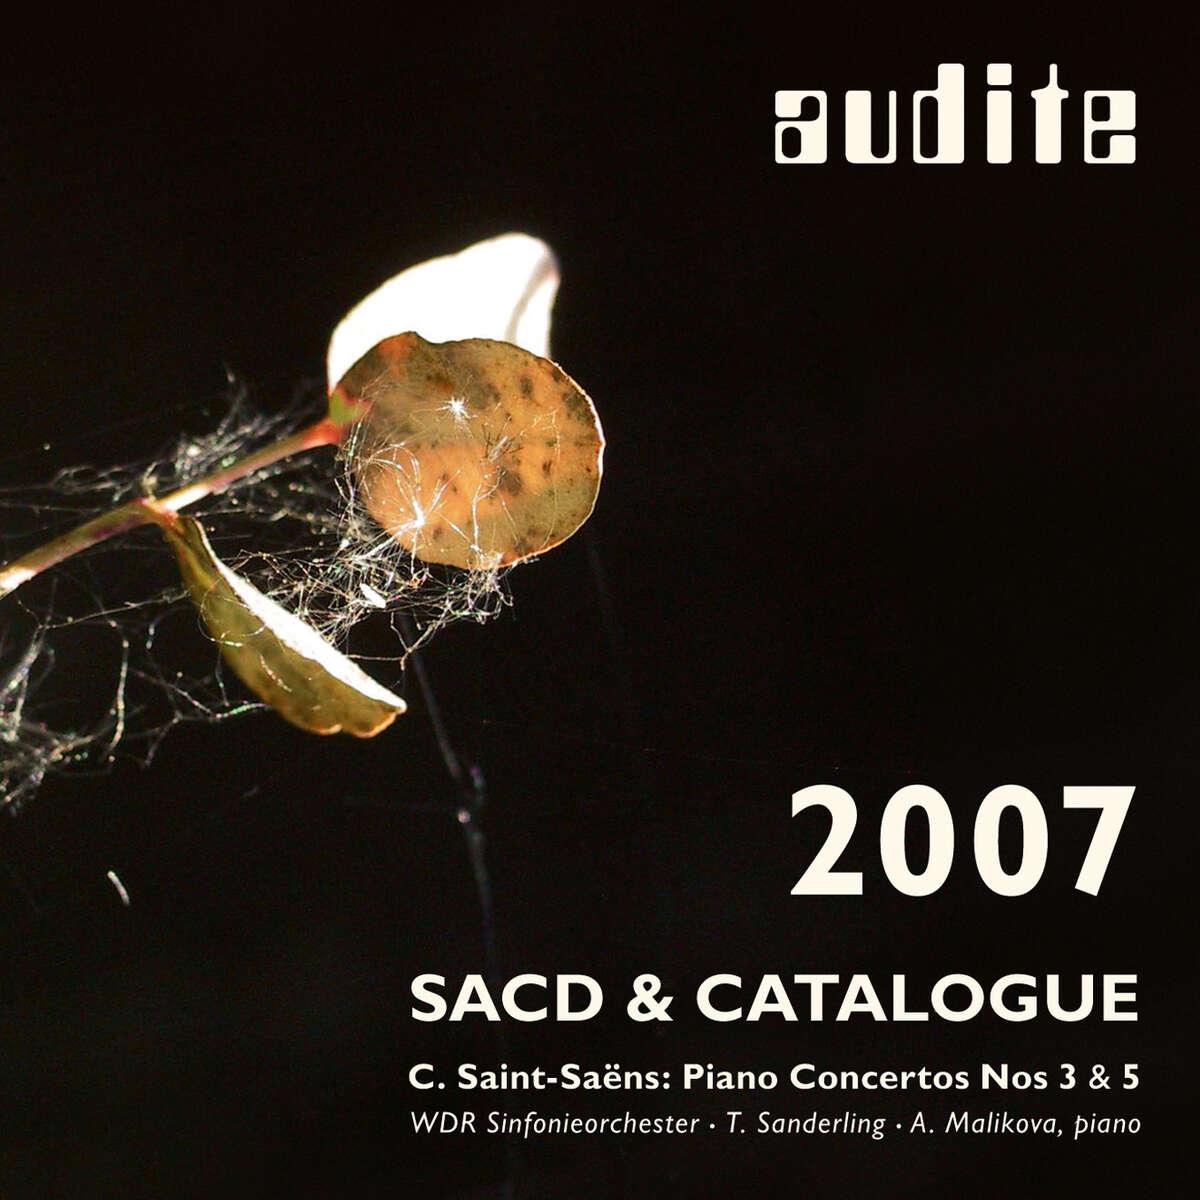 audite catalogue 2007 & SACD - Saint-Saëns: Piano Concertos Nos 3&5